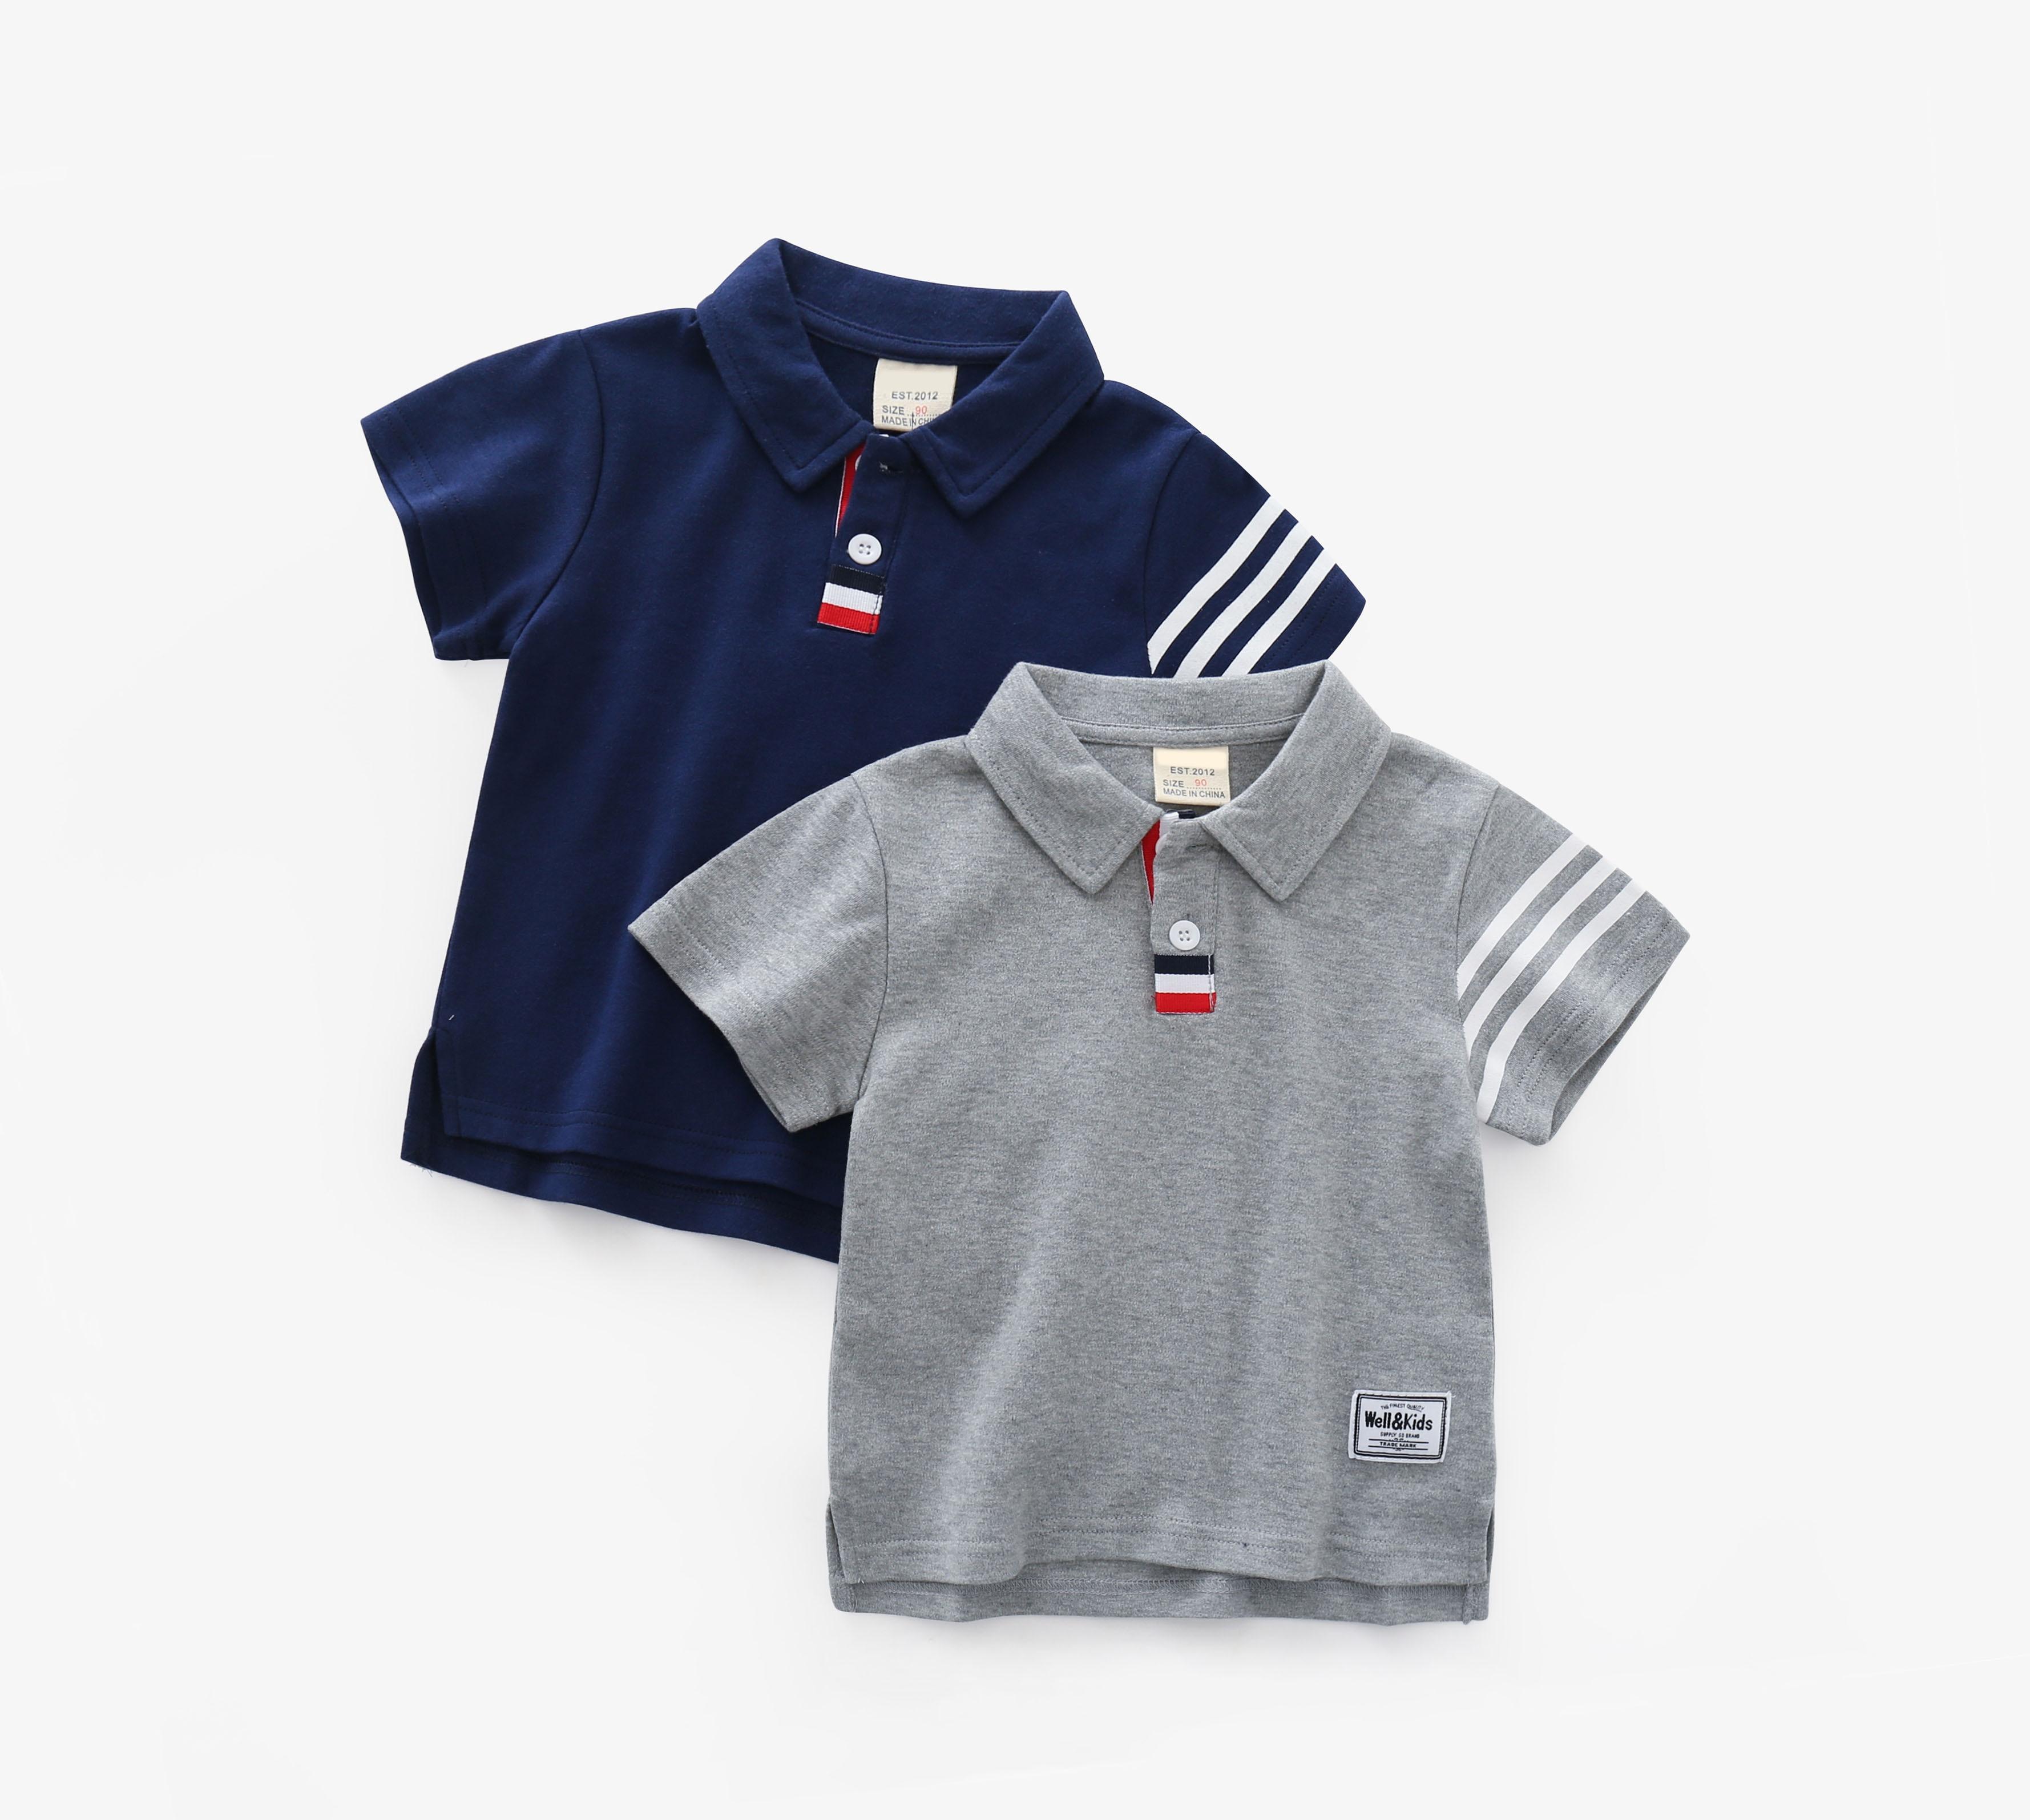 3c77cbe0a29 Kids Cotton Zip Sweater Outerwear Baby Boys Girls Knitwear 2017 ...